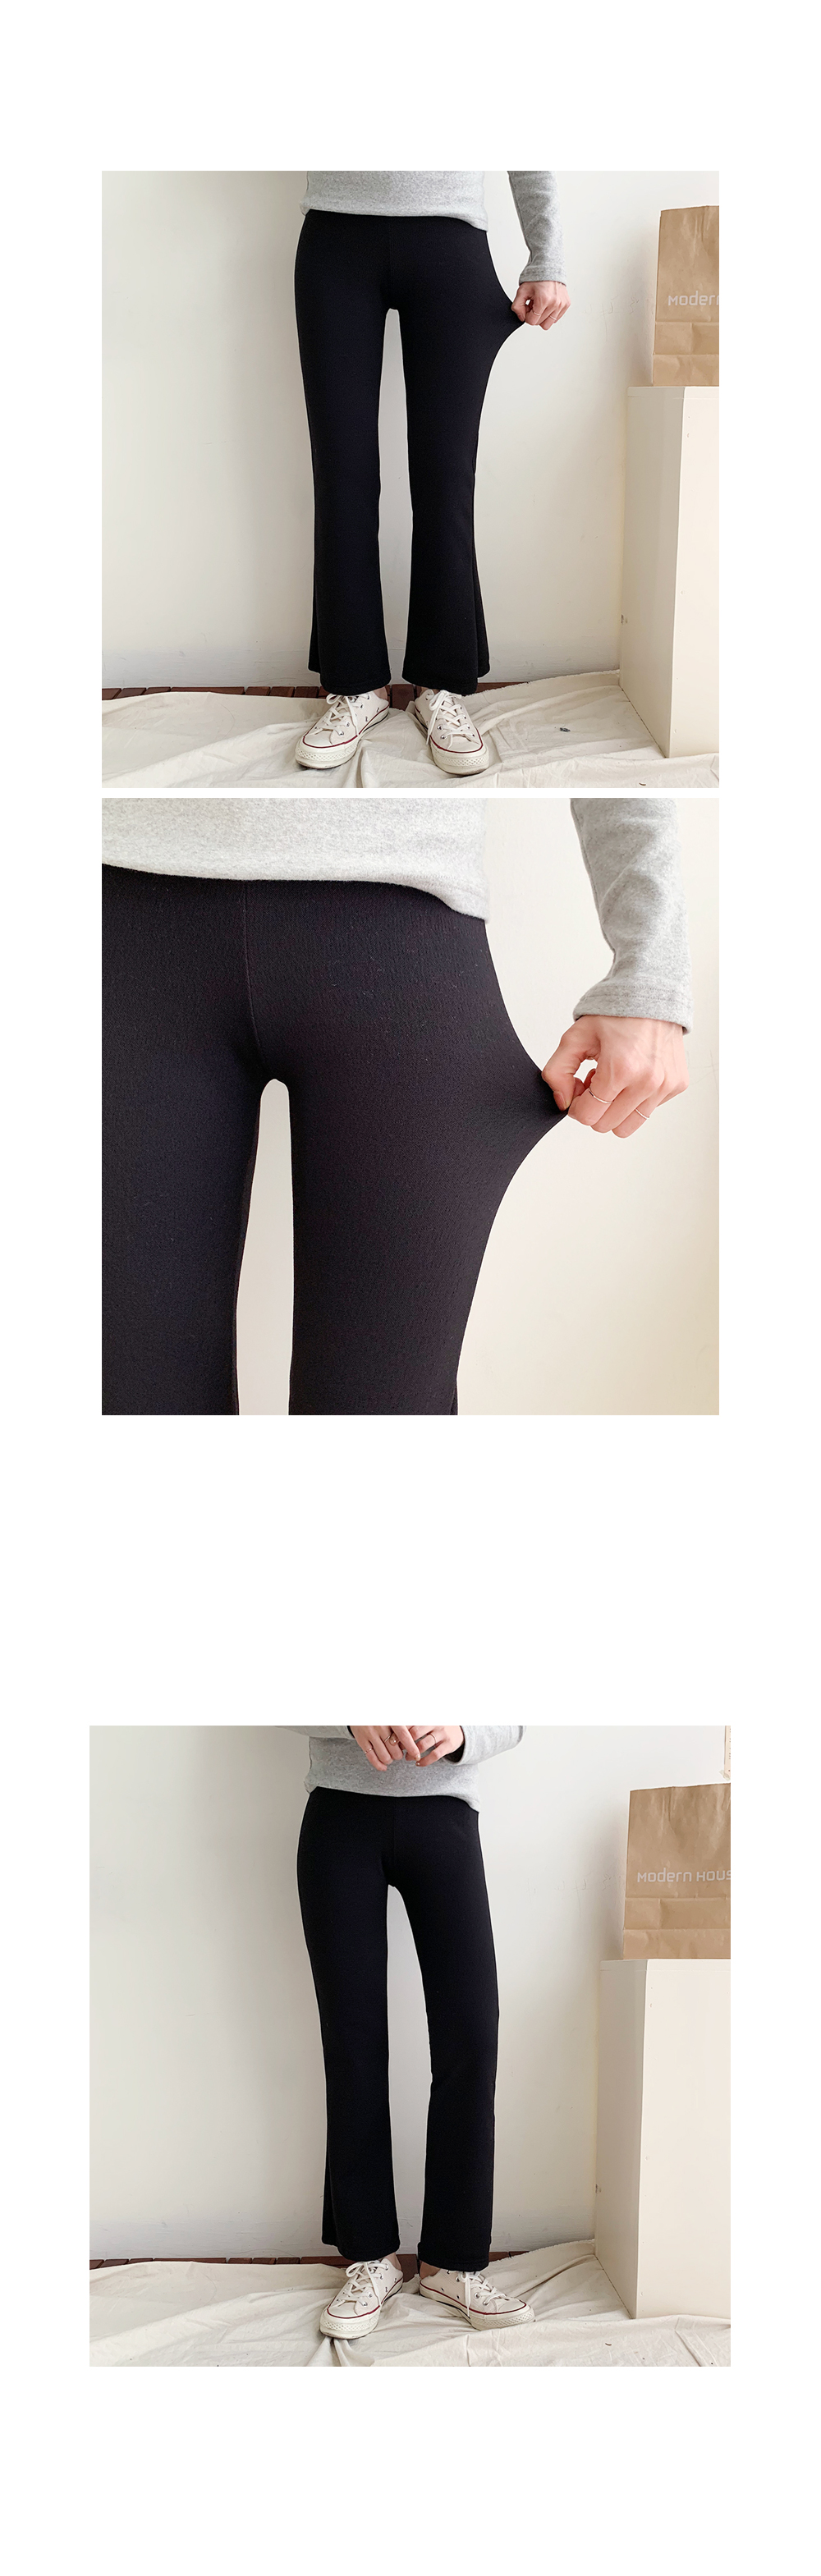 Raised thin boot cut banding pants